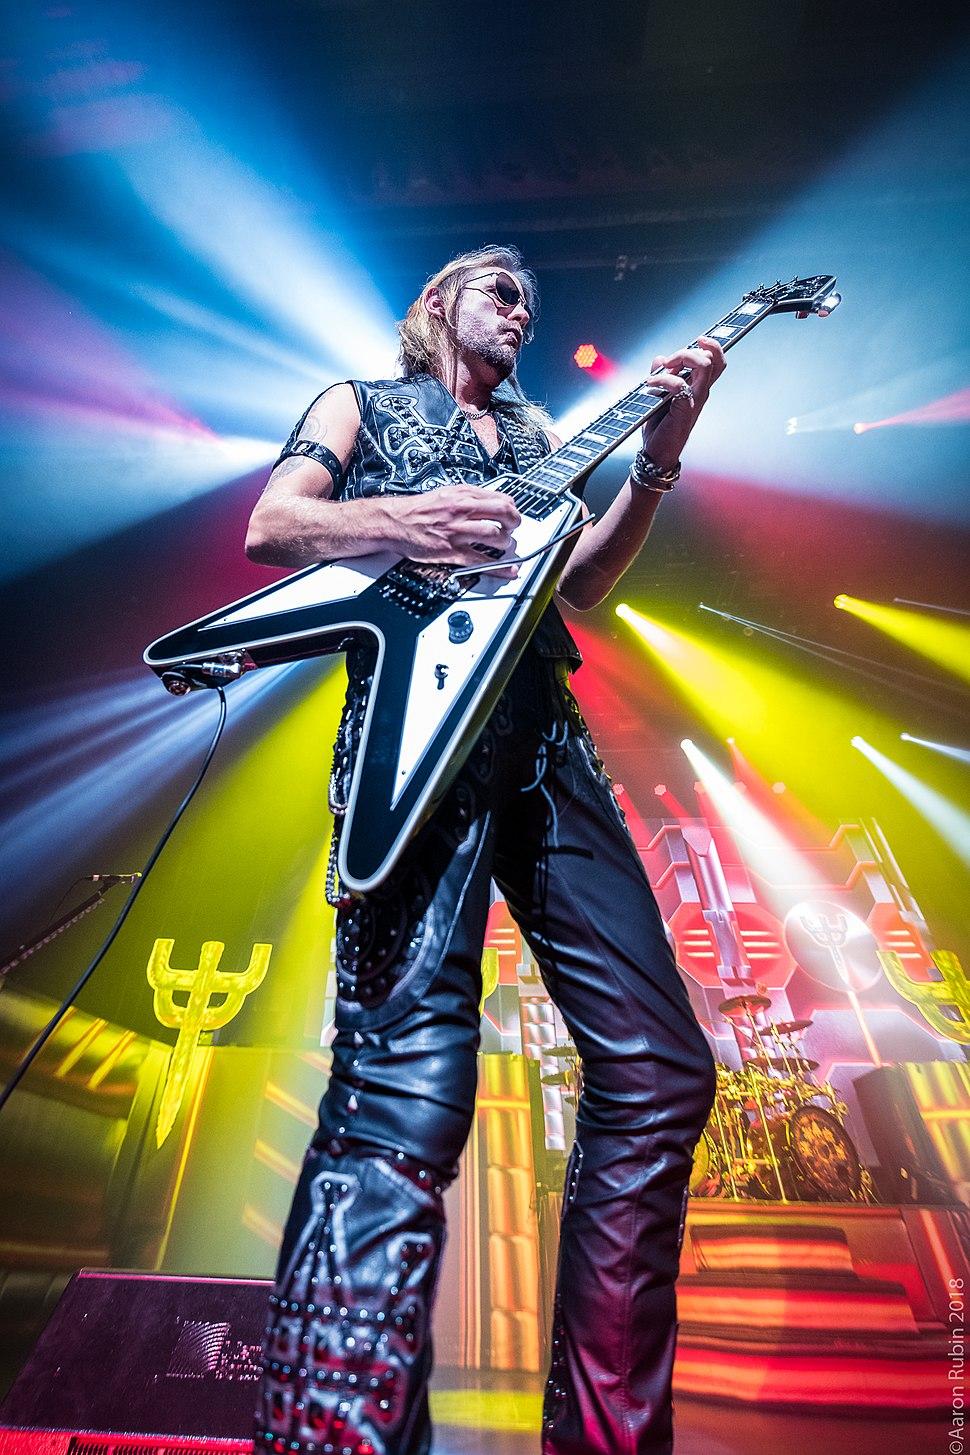 Richie Faulkner of Judas Priest